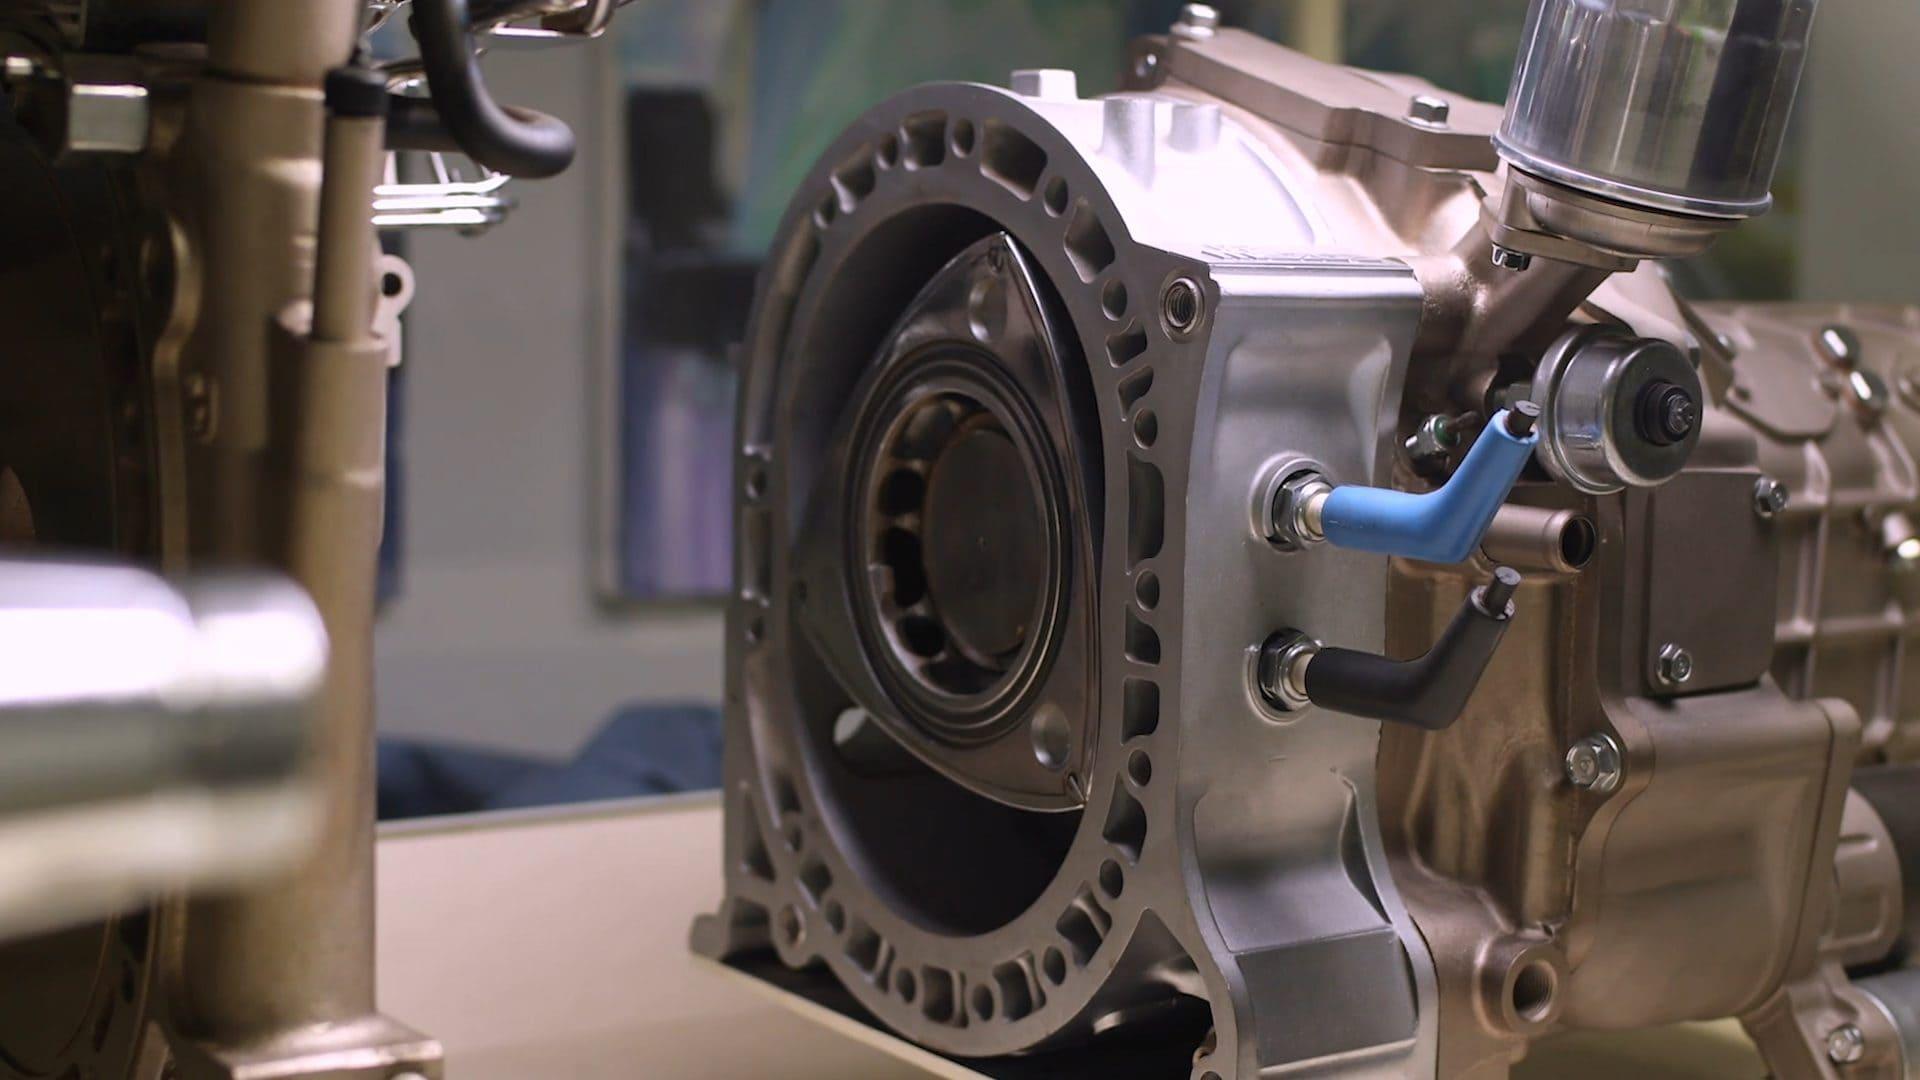 Rotary engine